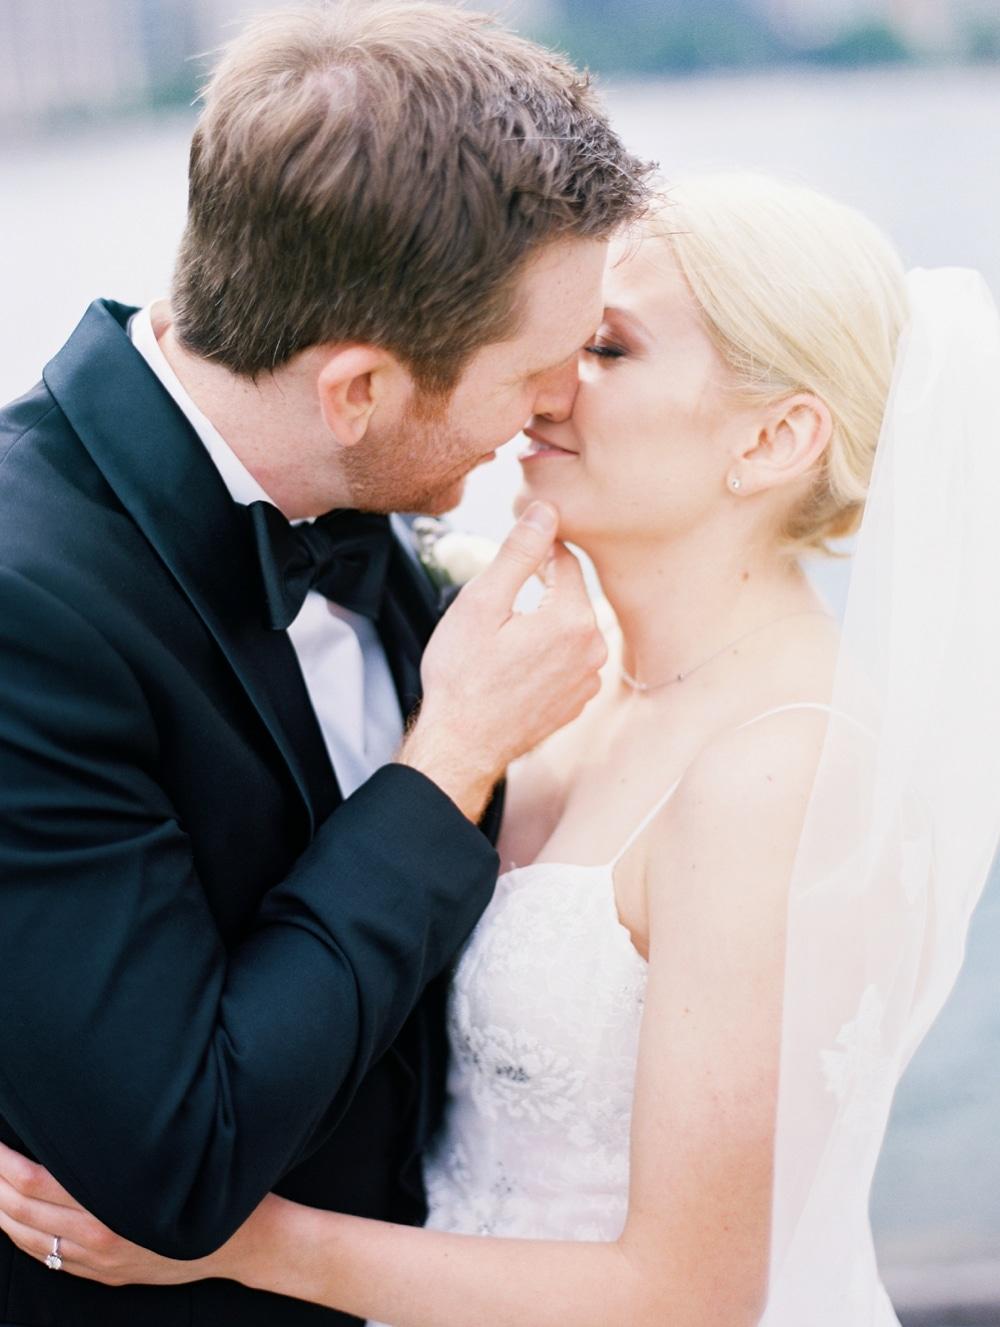 Kristin-La-Voie-Photography-salvatore's-chicago-wedding-photographer-90